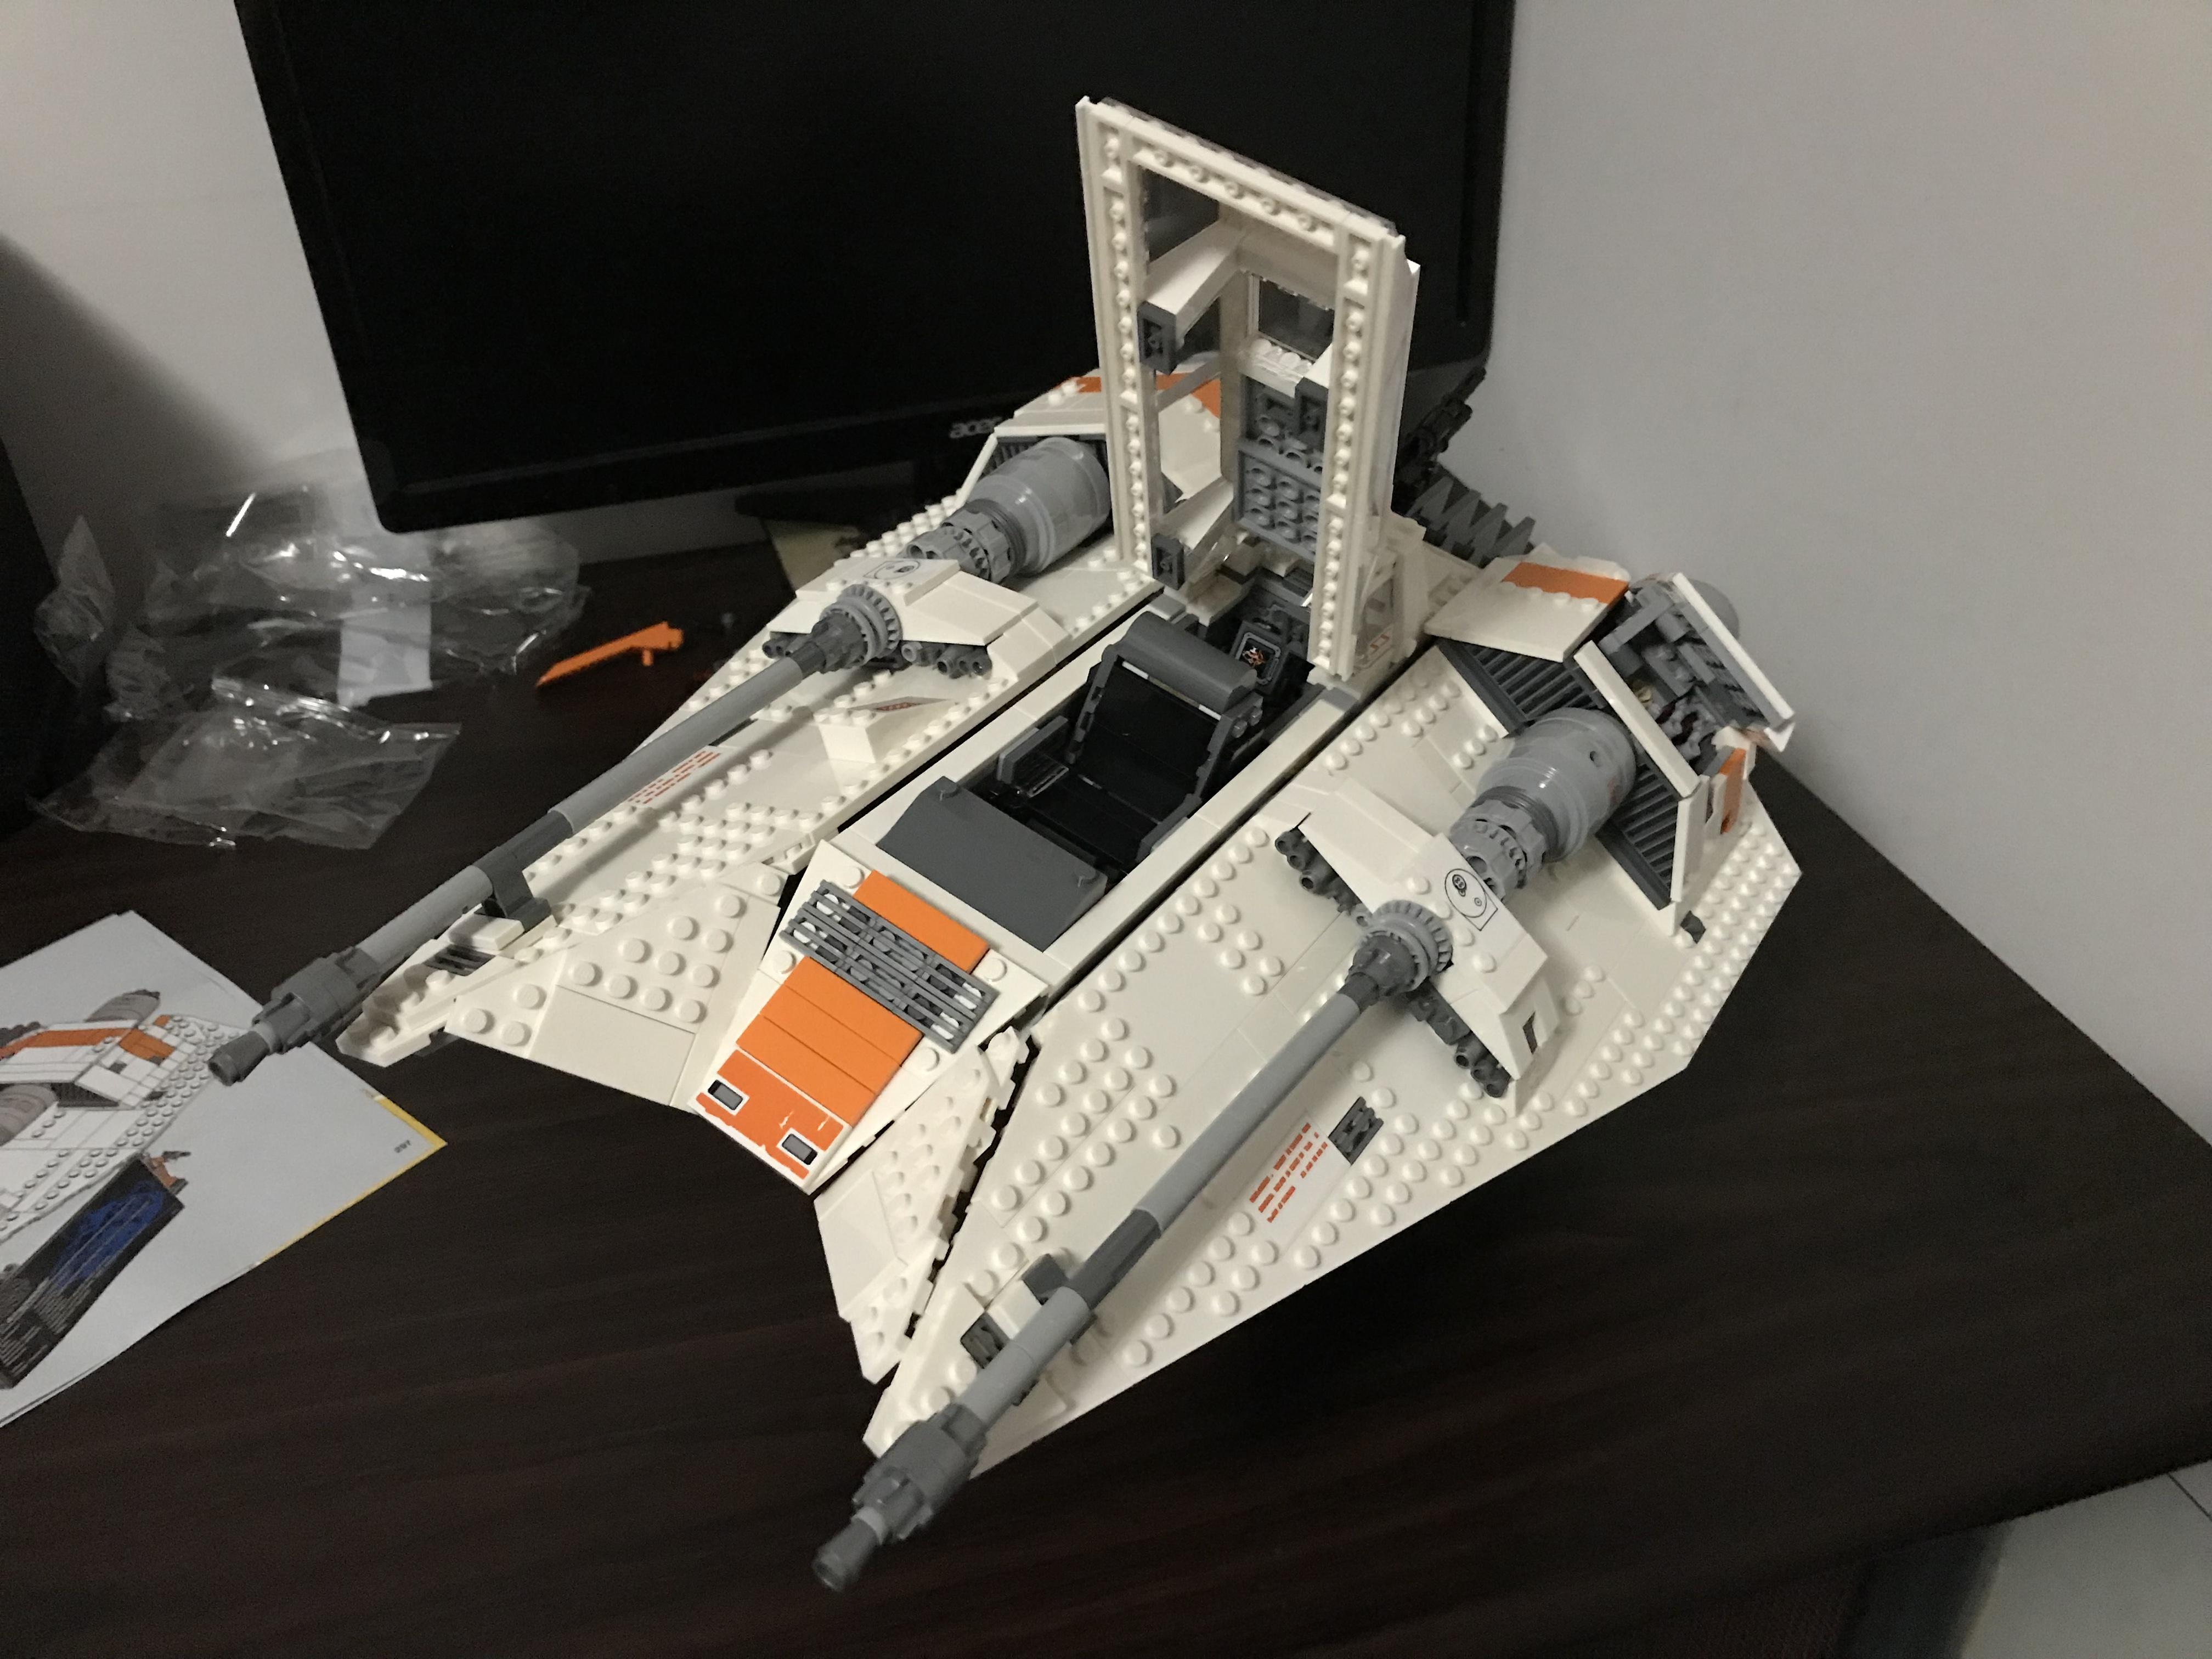 PassionLes Geekzone Forum Qui Lego RespectentBlabla Briques Se hCsrQtd